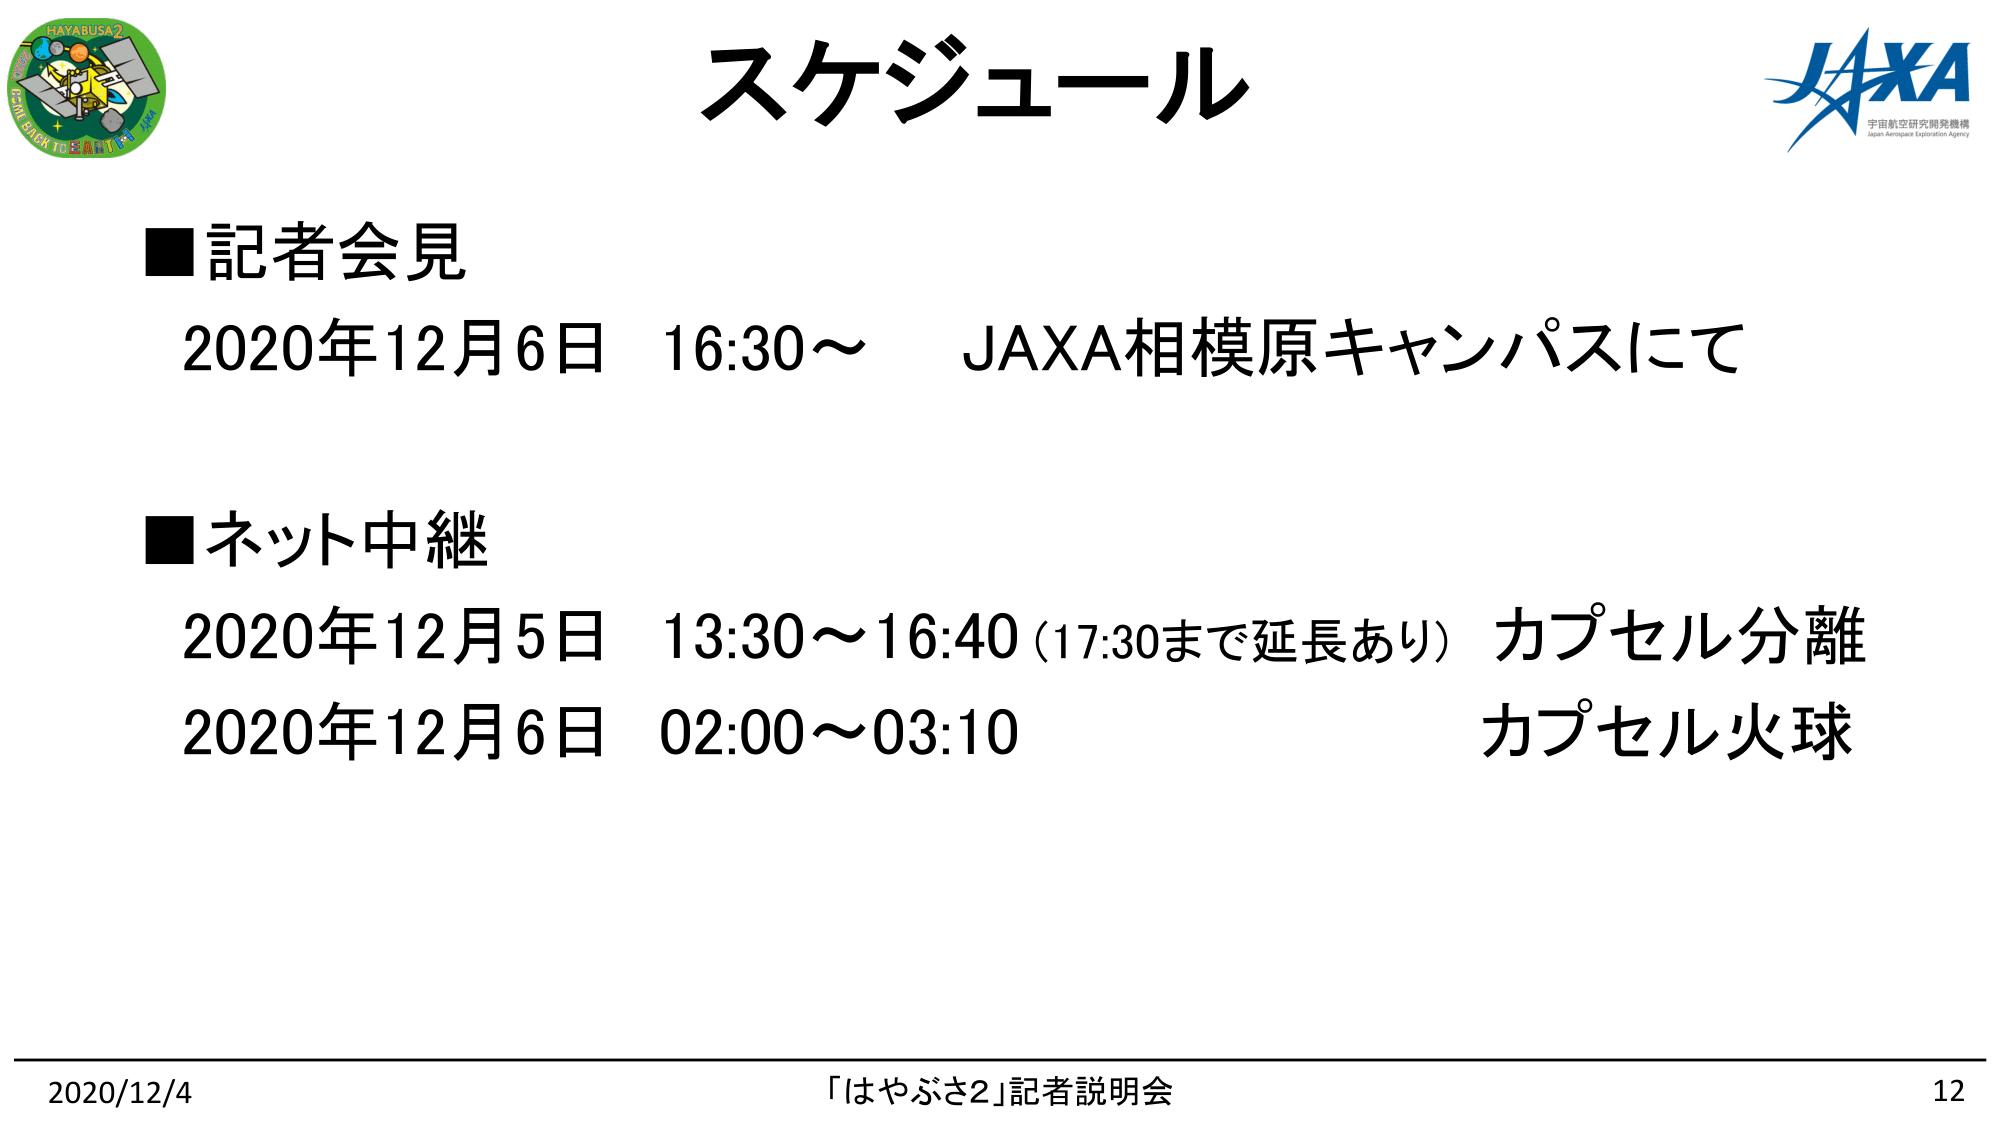 f:id:Imamura:20201204153845p:plain